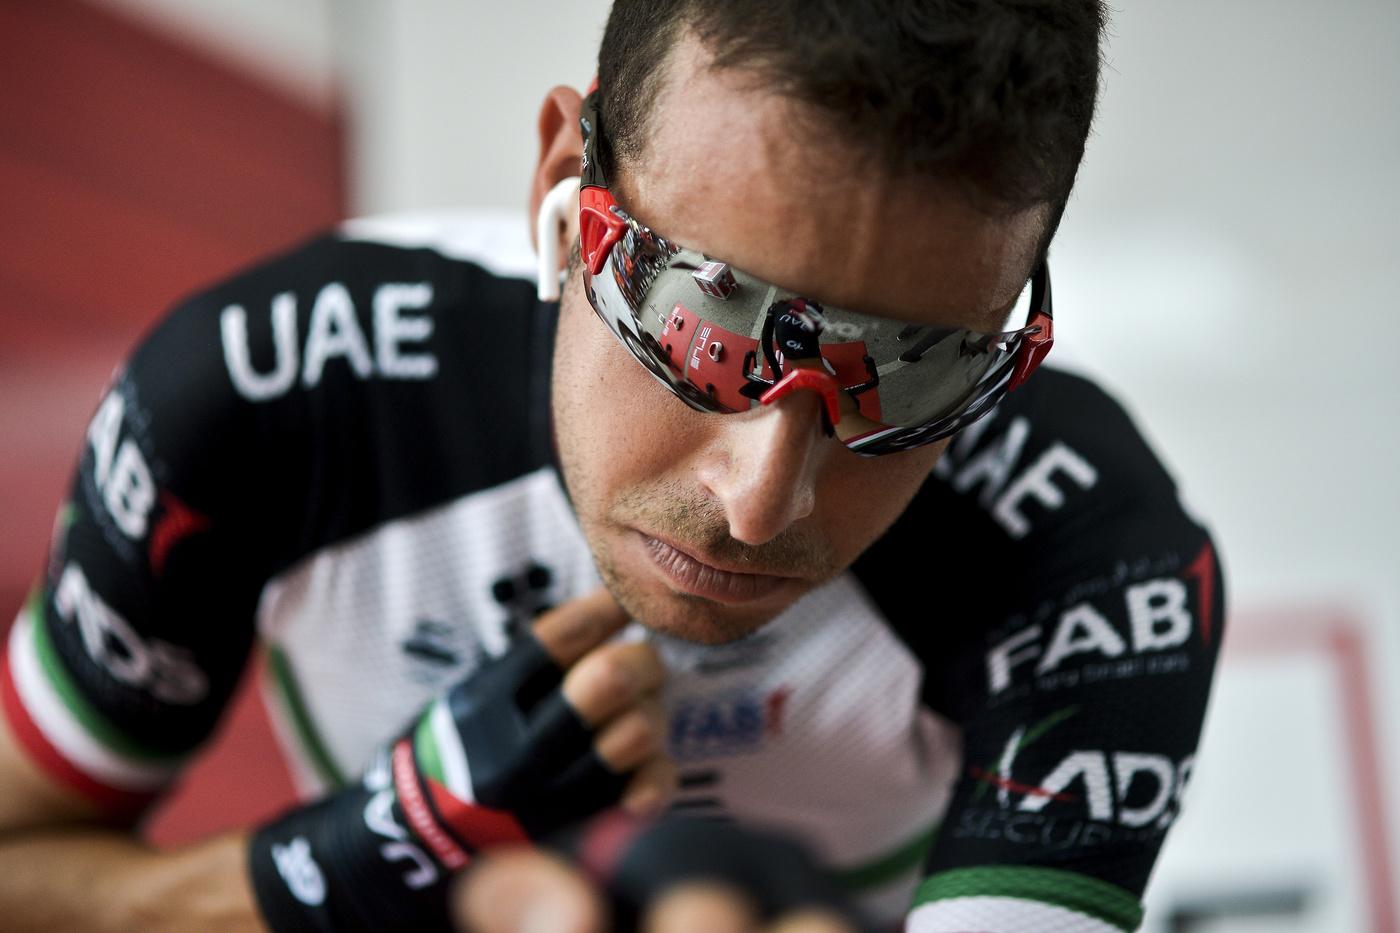 Vuelta, Rohan Dennis vince anche la seconda crono; Yates guadagna su Valverde